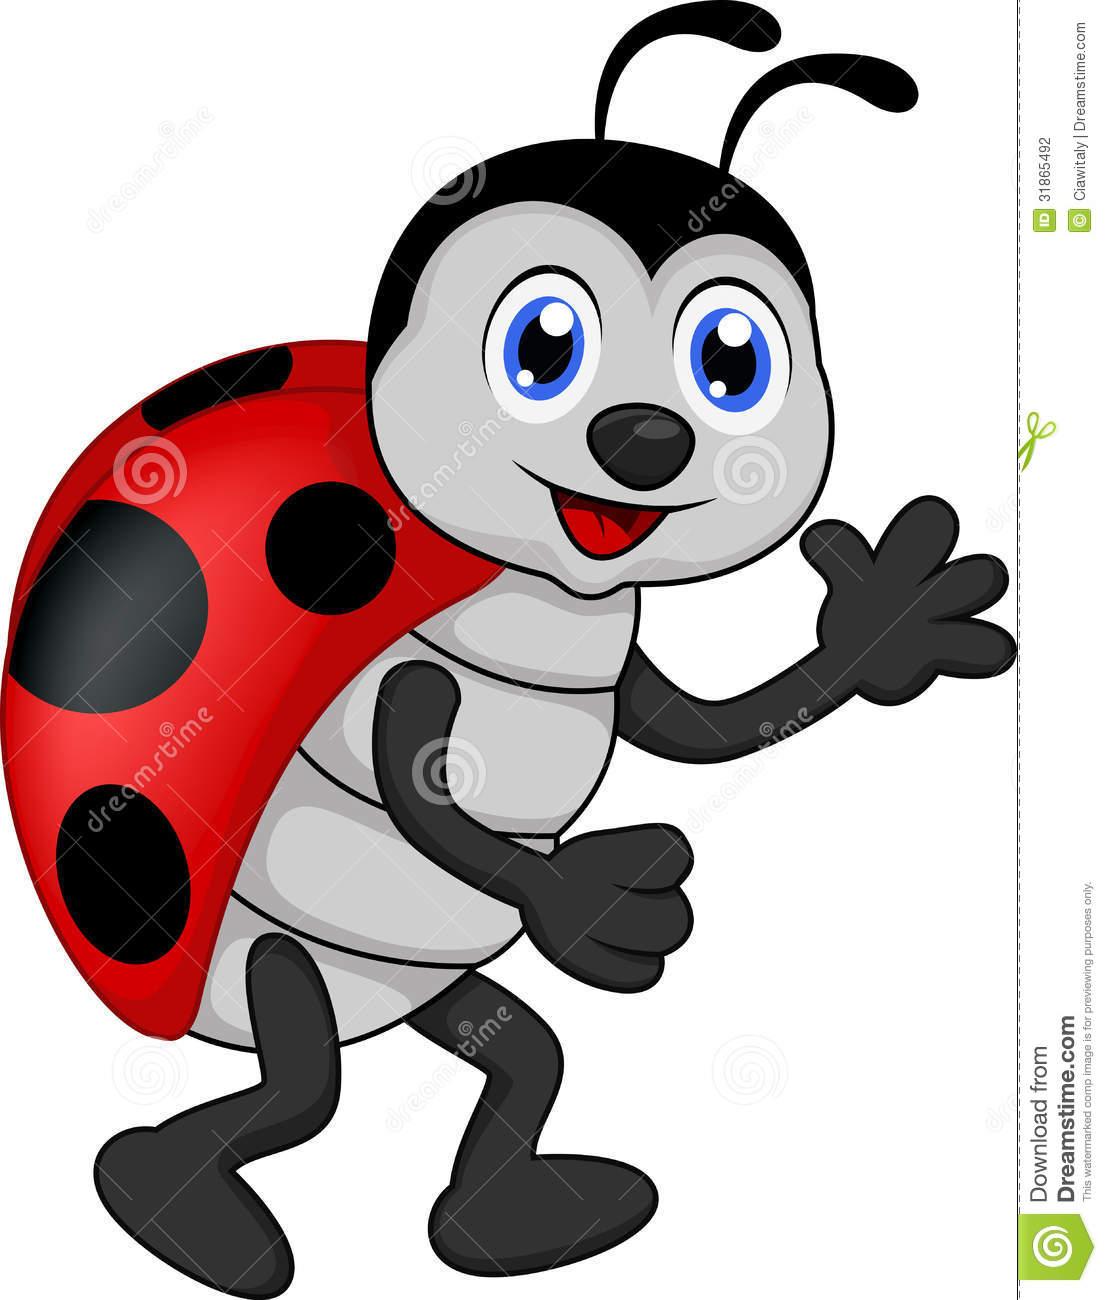 Cartoon Ladybugs Ladybug Pictures How To Draw